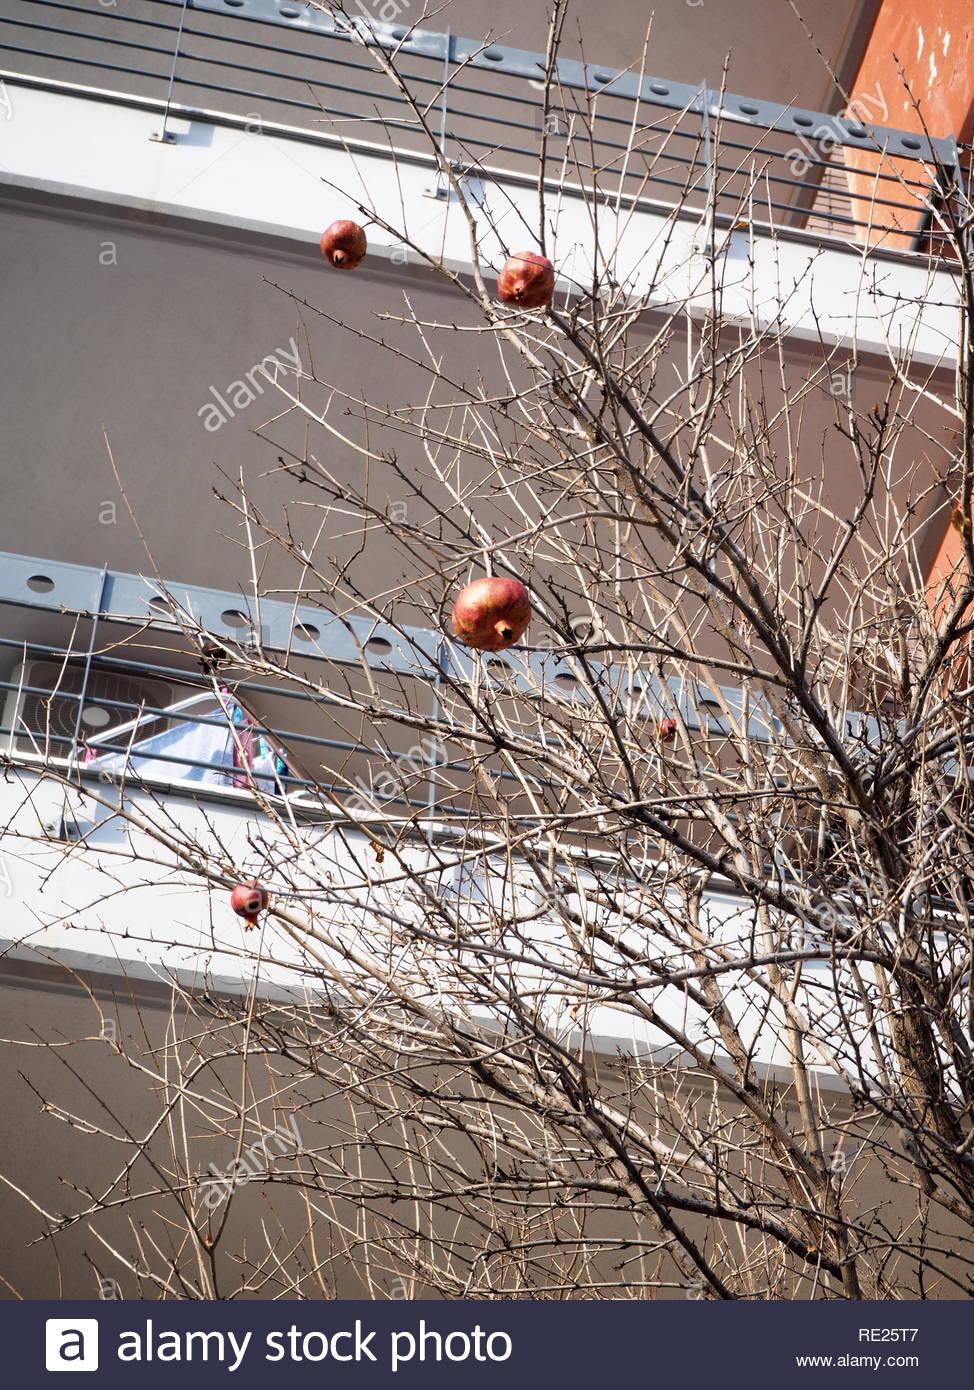 Pomegranate tree with pomegranates on it closer look - Stock Image